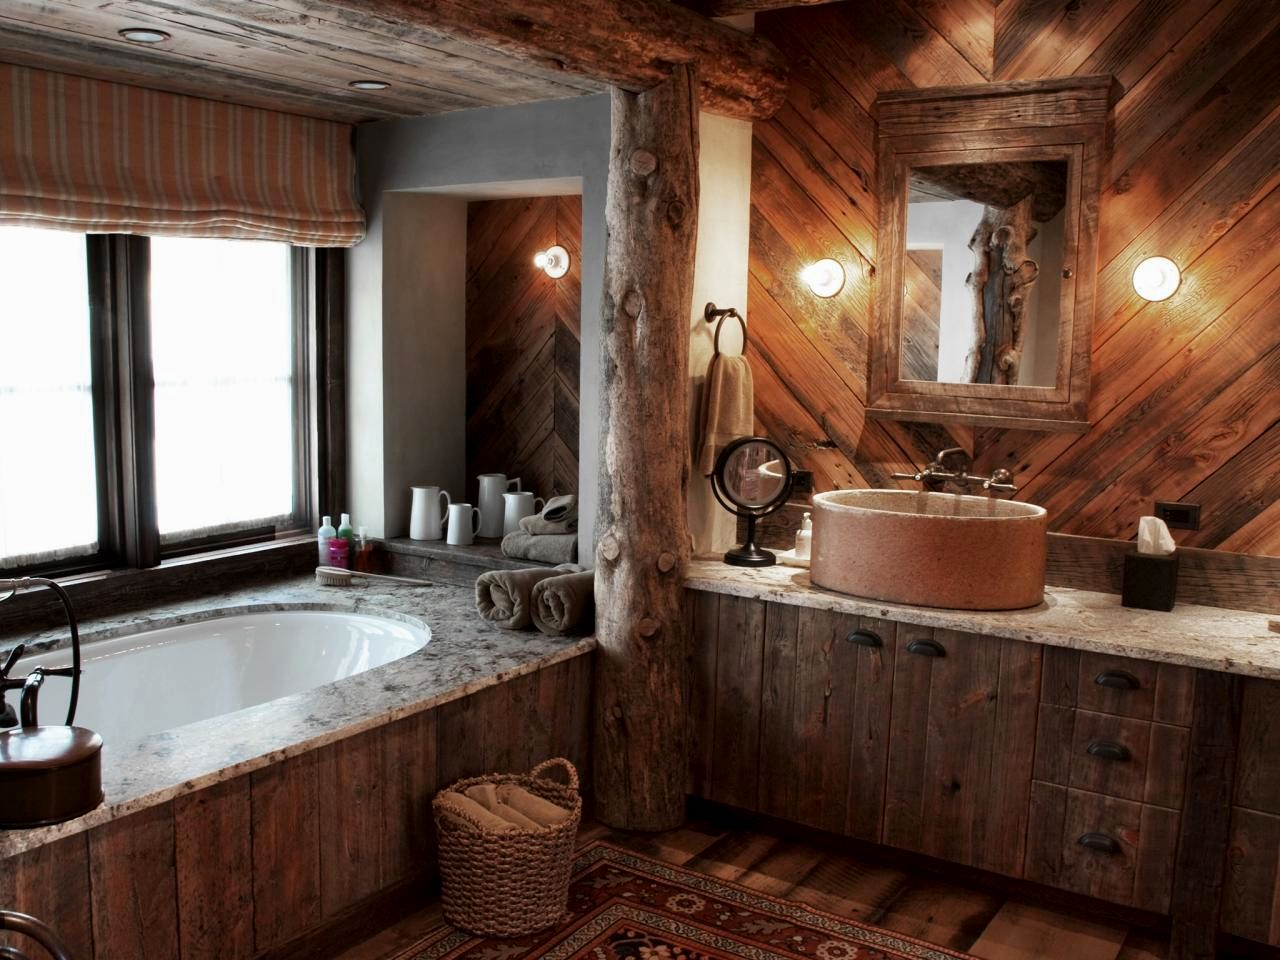 elegant modern bathroom sinks decoration-Amazing Modern Bathroom Sinks Layout